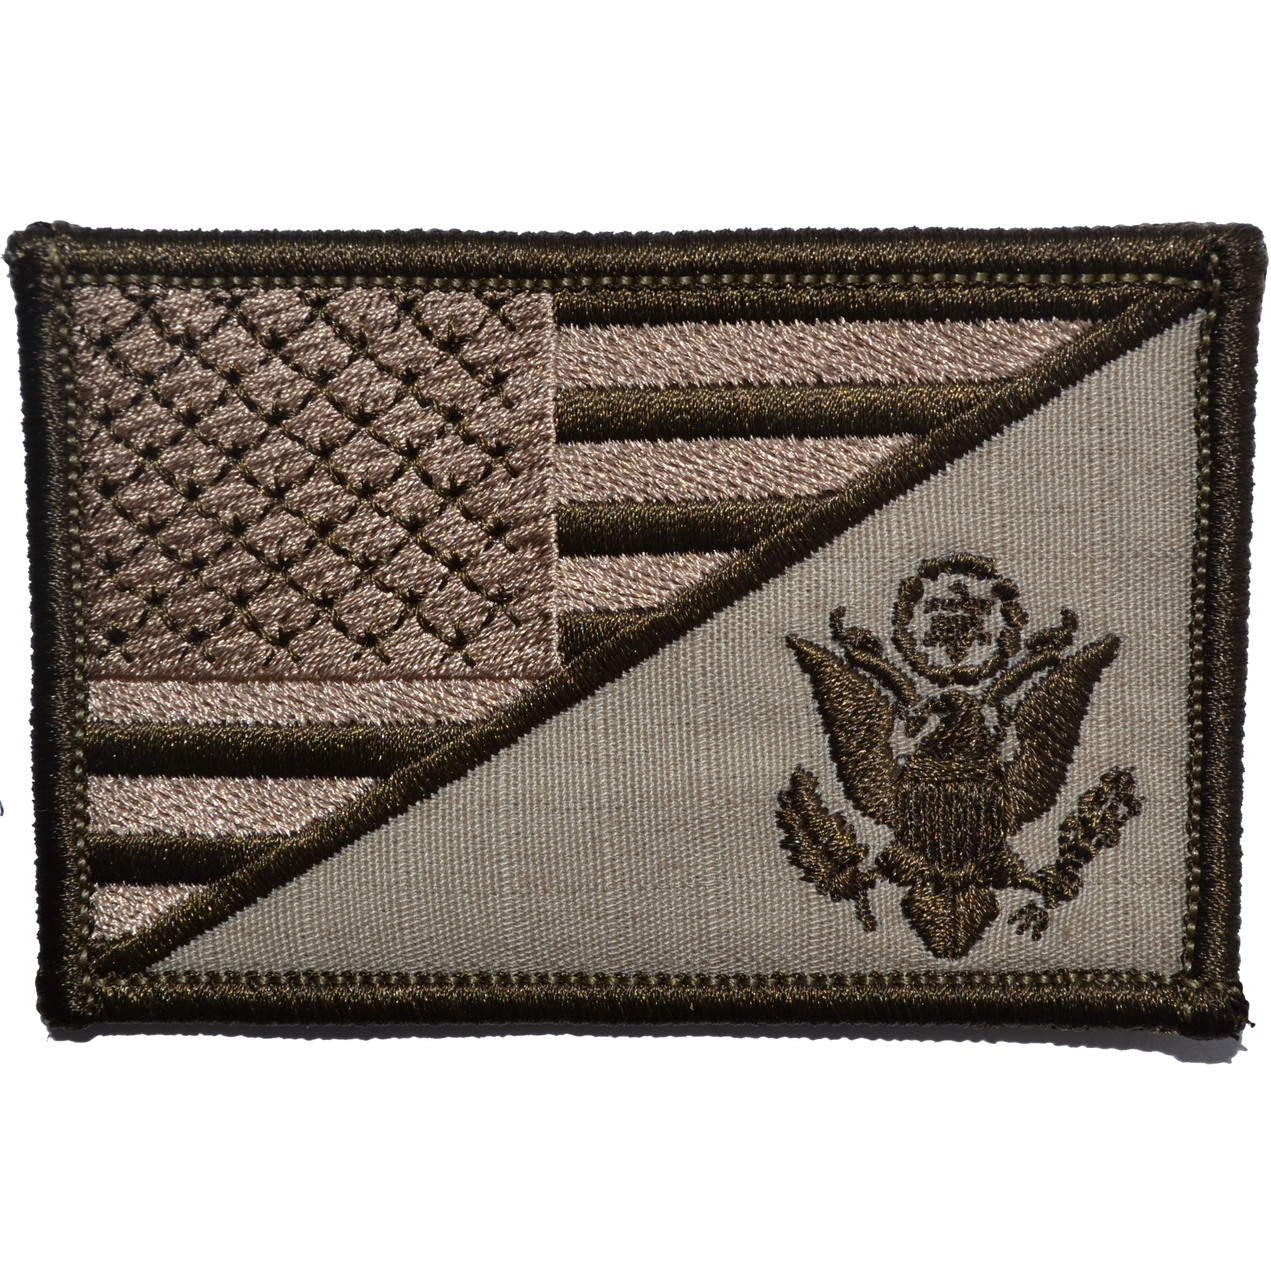 US Army USA Flag - 2.25x3.5 Patch